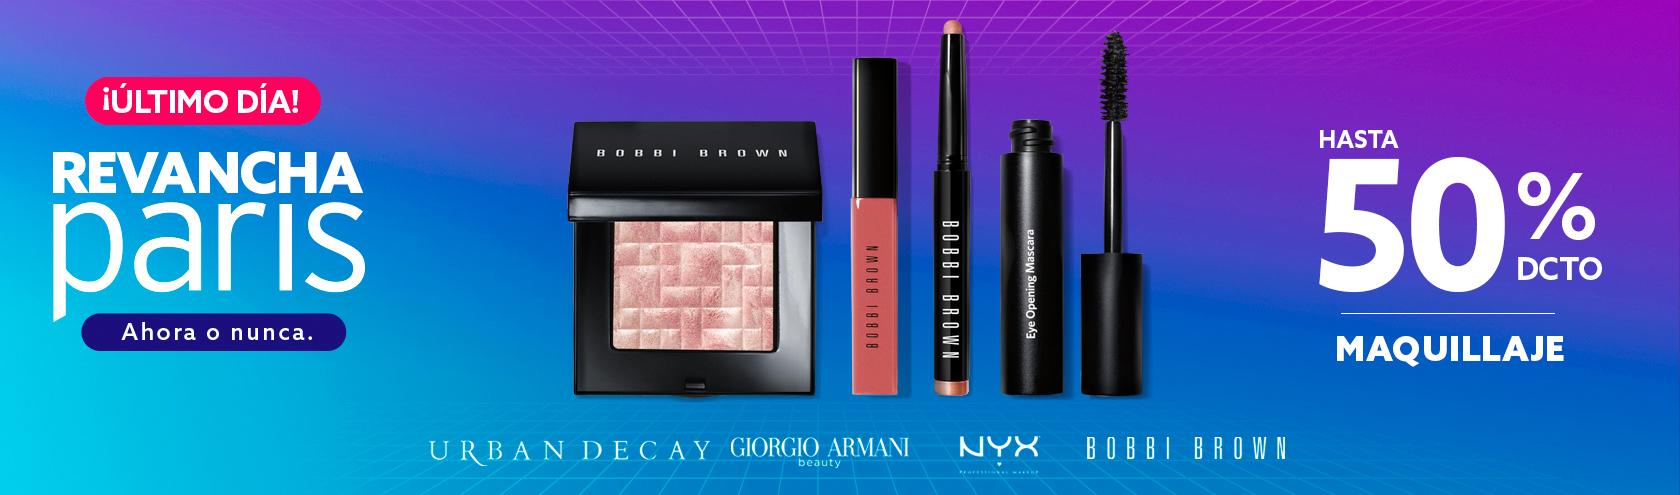 Hasta 50 porciento de descuento en maquillaje, Nyx Proffesional Make Up, Bobbi Brown, Urban Decay, Armani Make Up